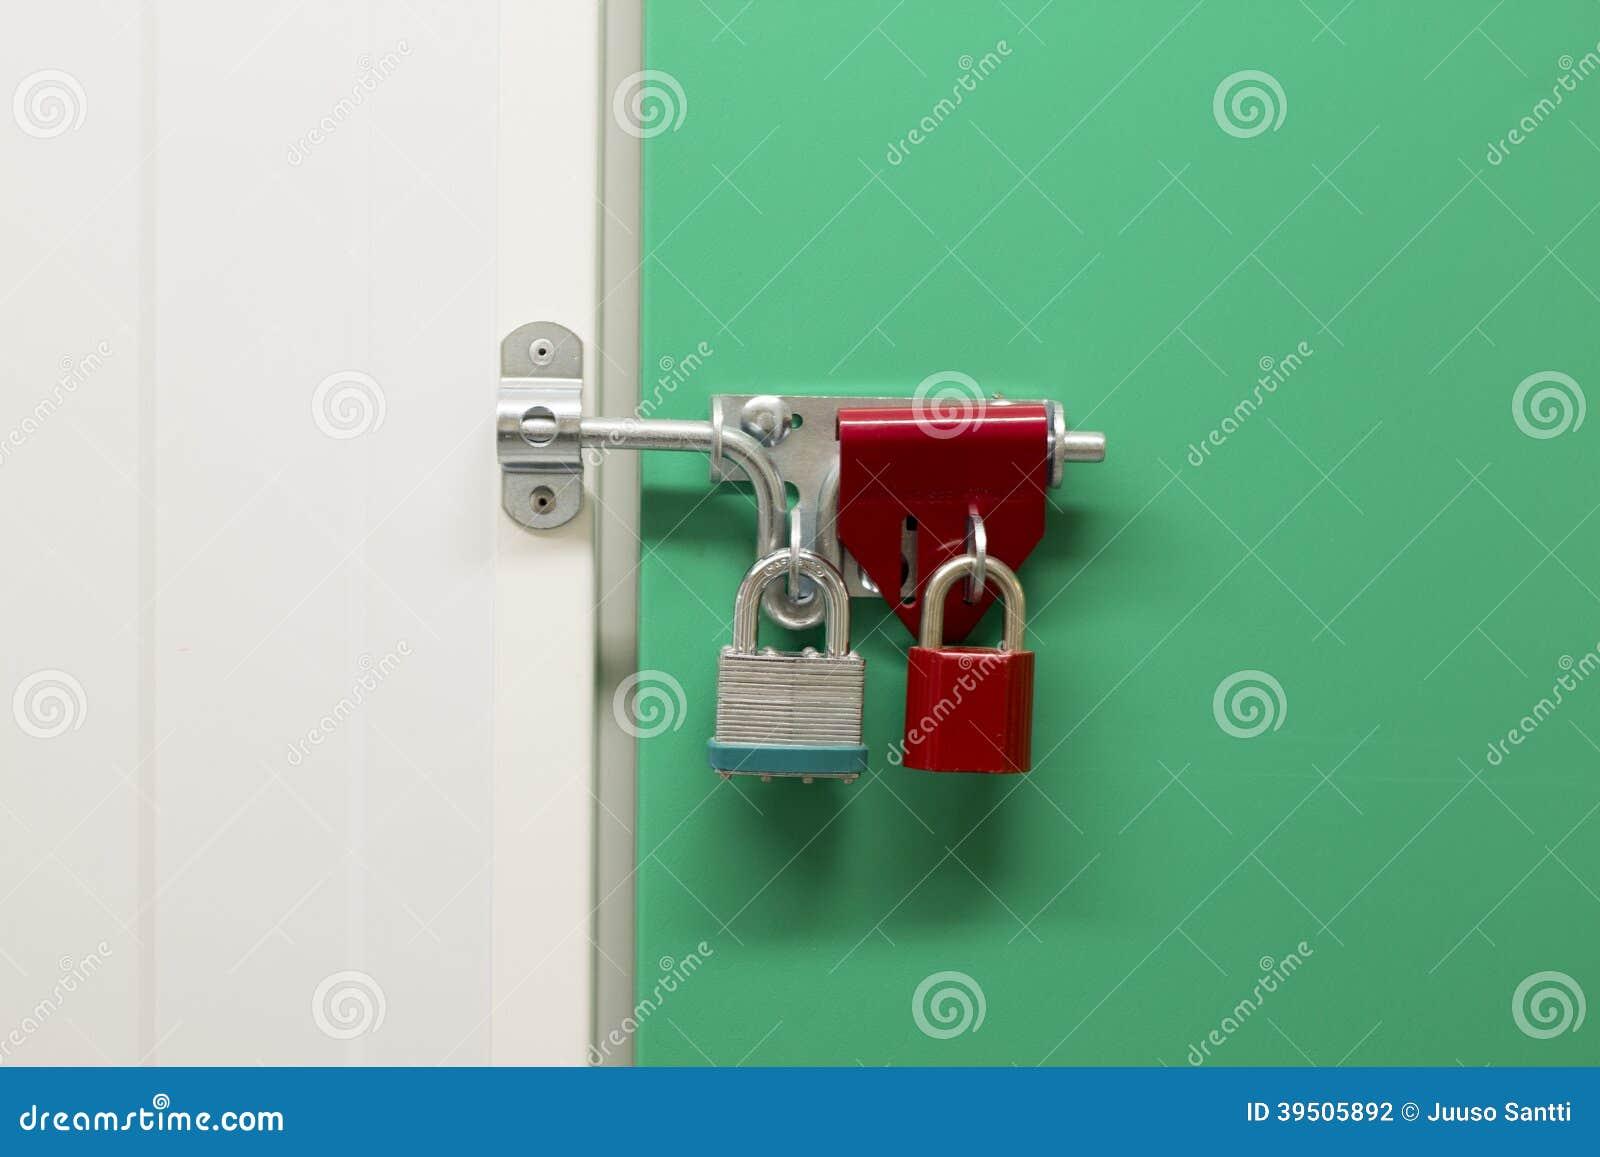 Over locked Storage unit